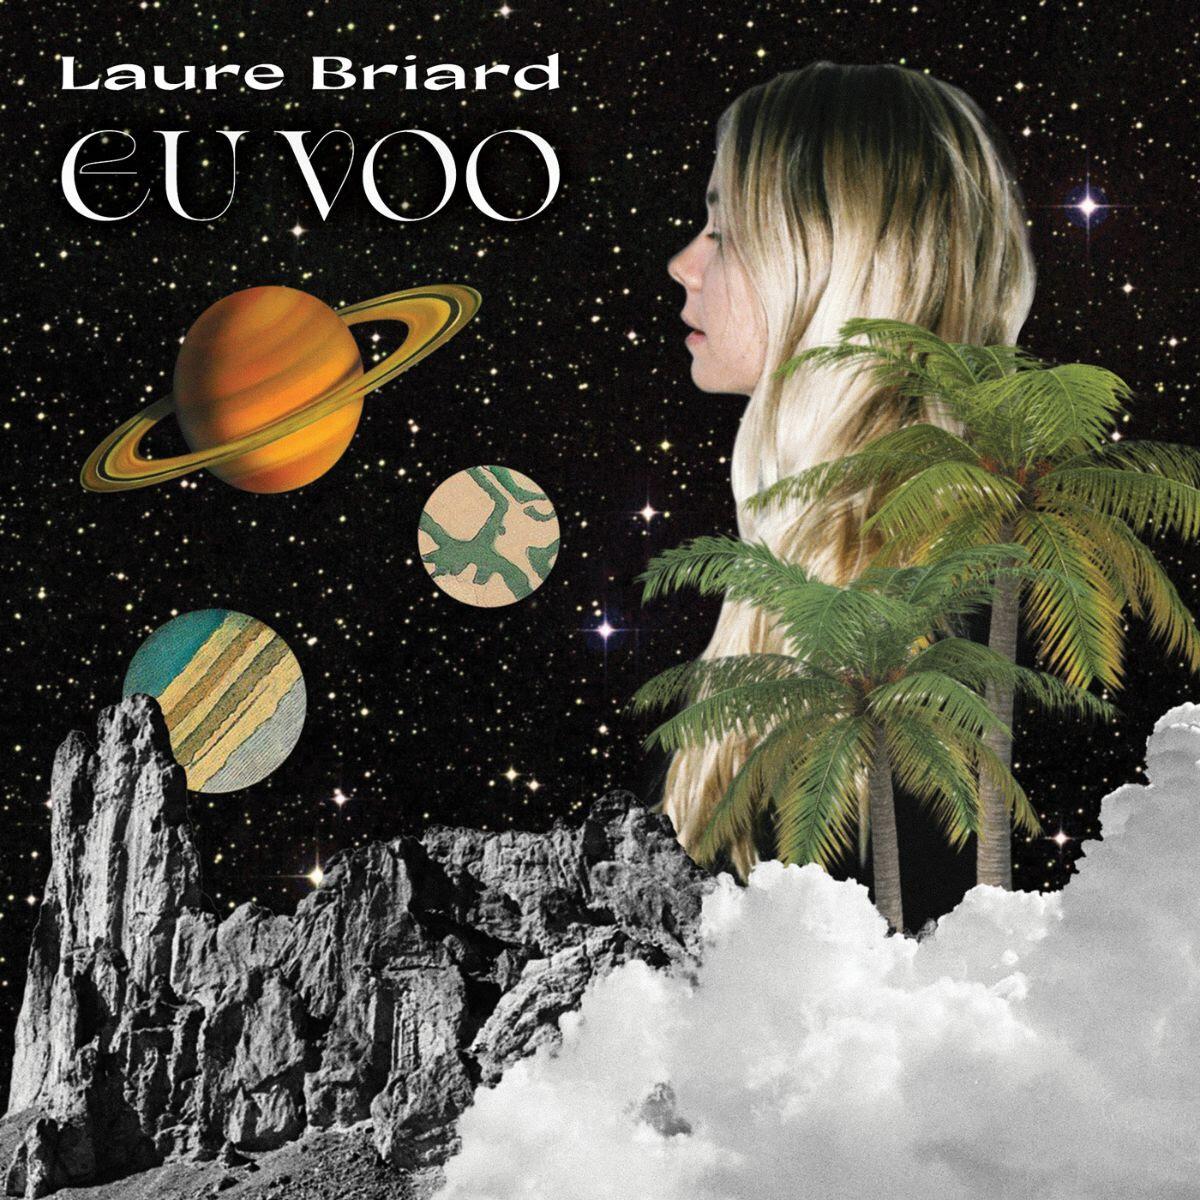 Nuevo EP Laure Briard